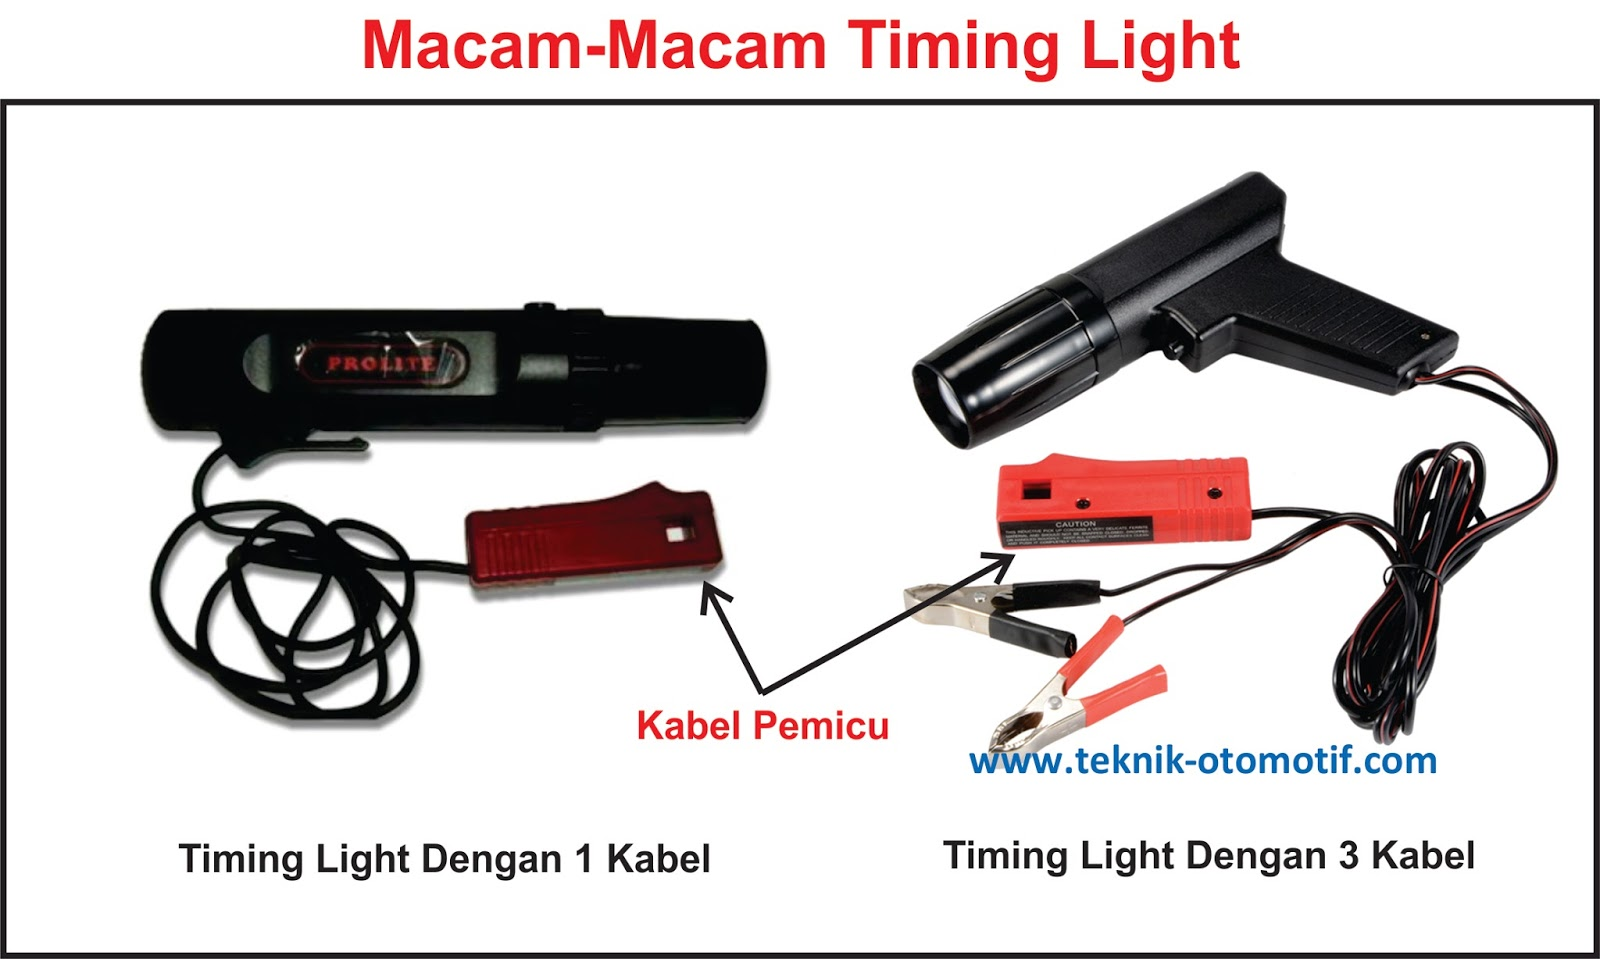 Fungsi Timing Light Dan Cara Penggunaannya Jelaskan Memeriksa Wiring Alat Ukur Mirip Dengan Sebuah Senter Untuk Lebih Jelasnya Dapat Dilihat Pada Gambar Di Bawah Ini